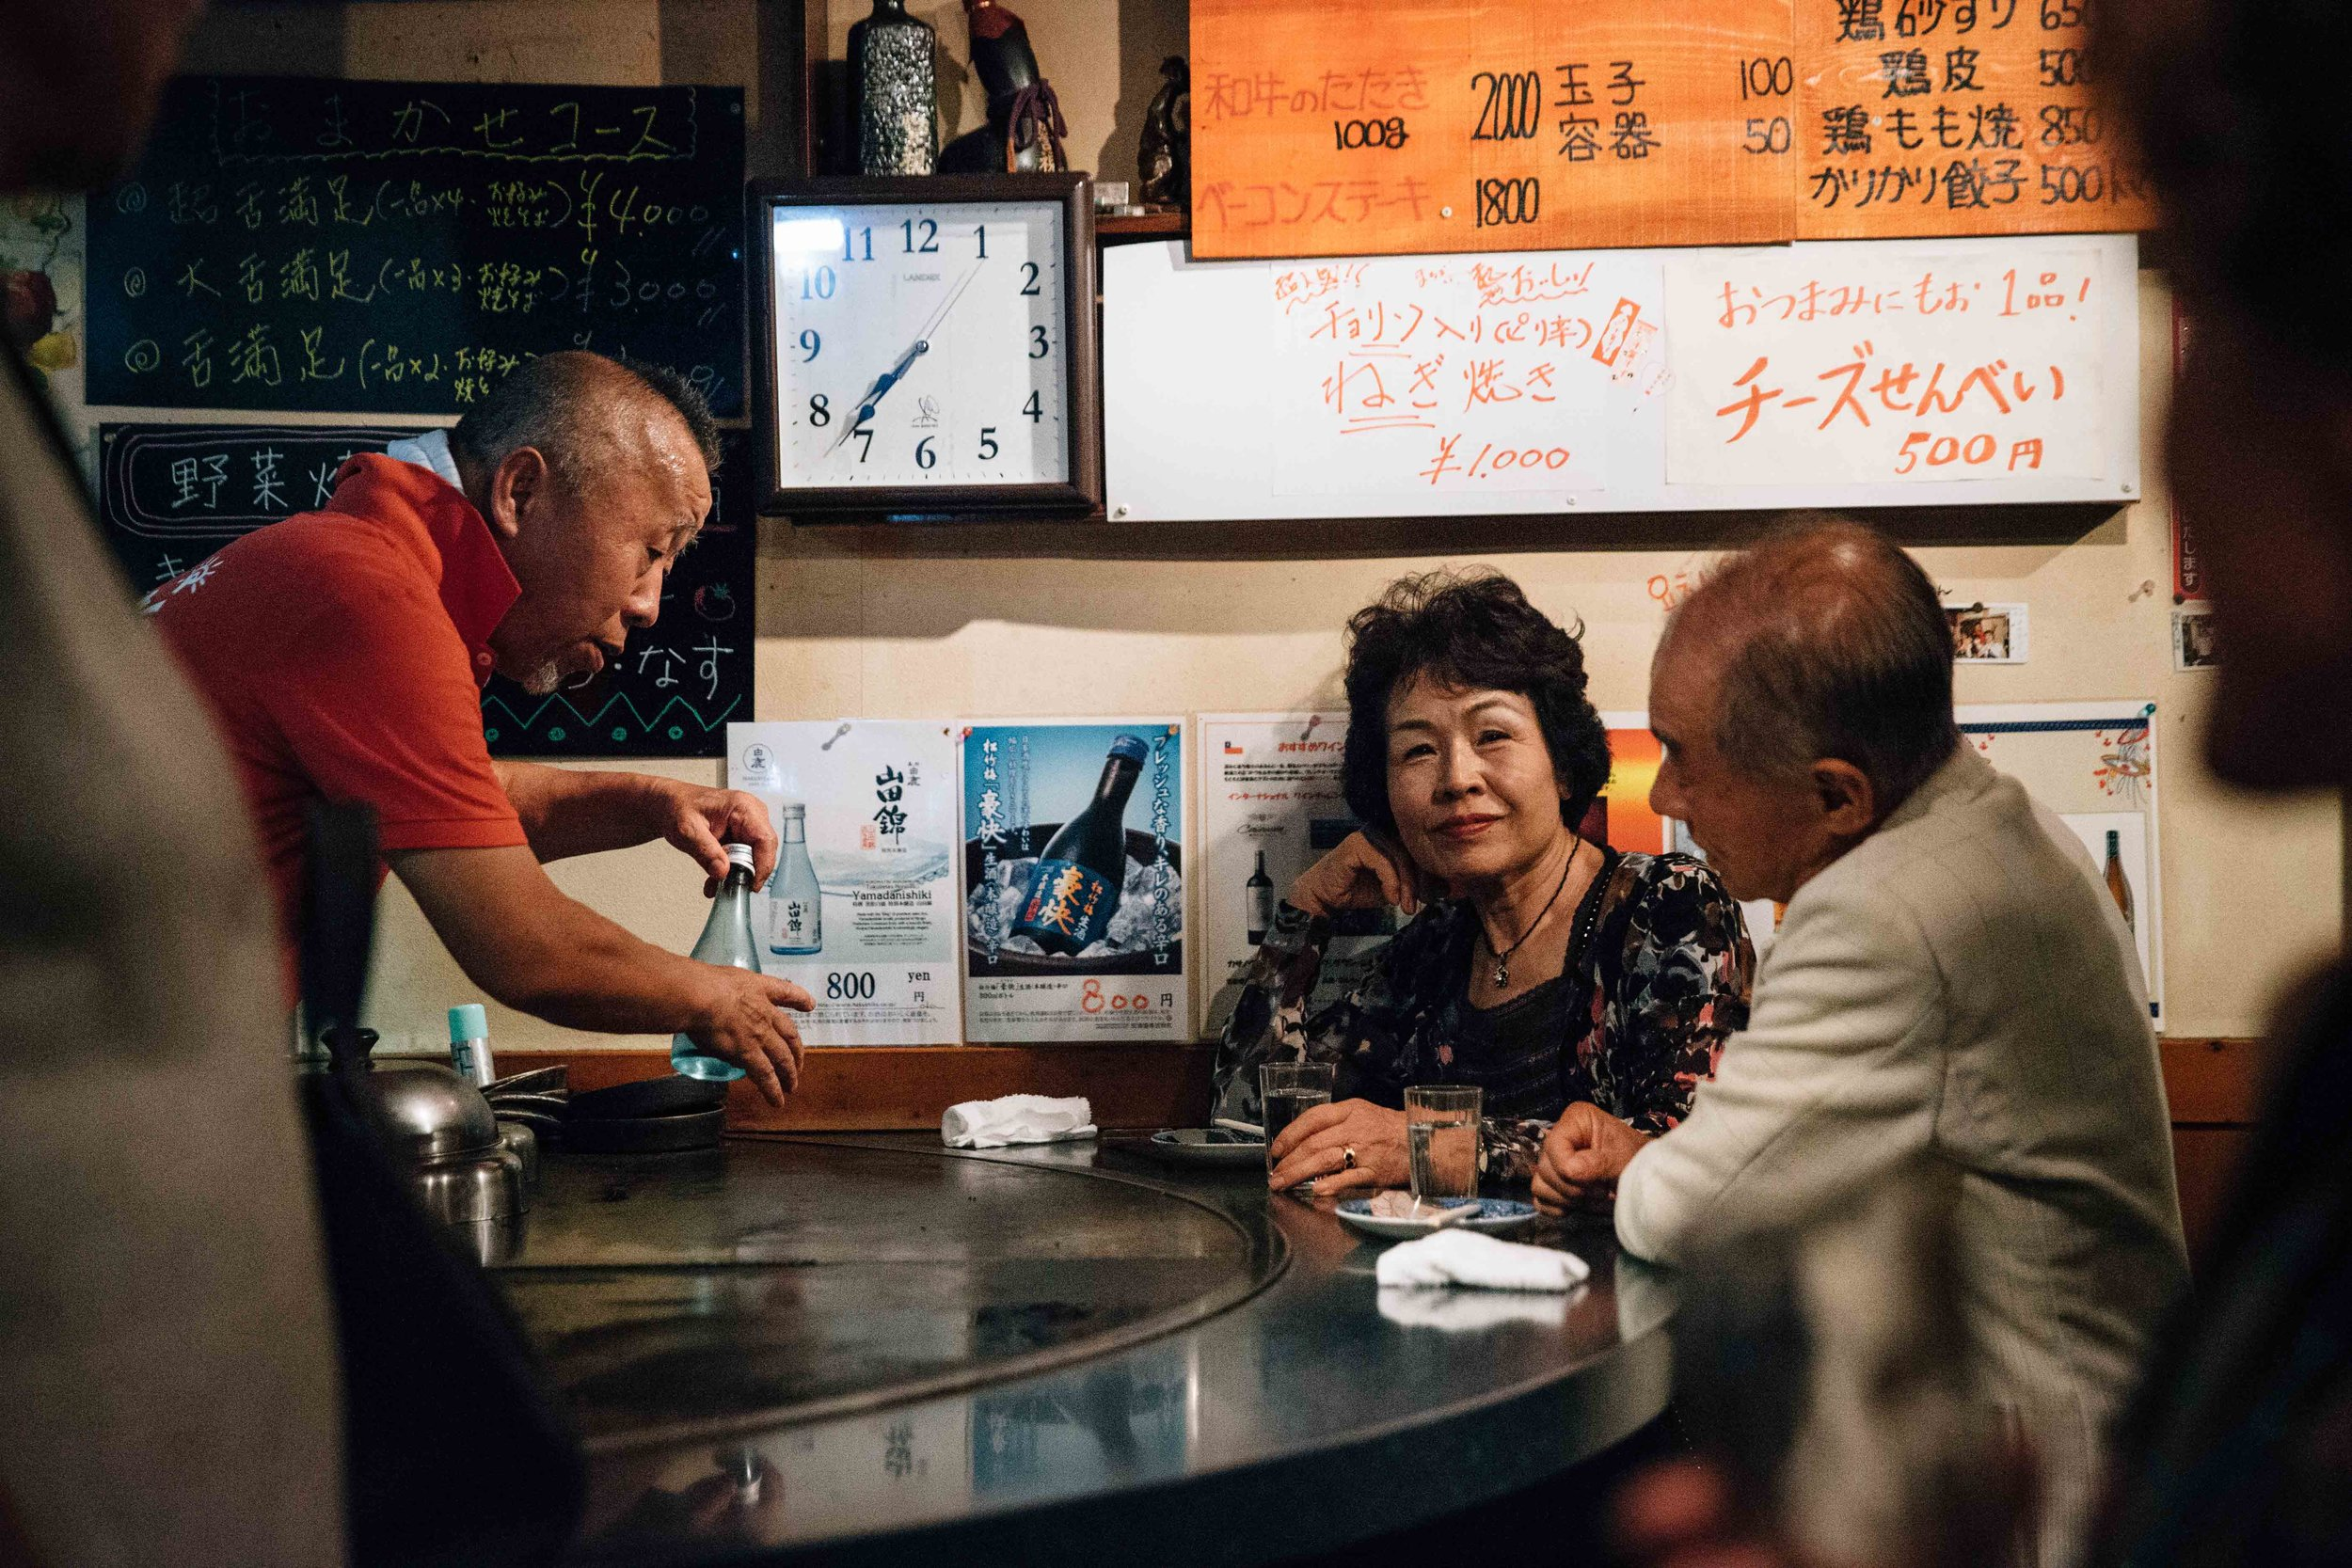 ajwells_japan-0008.jpg